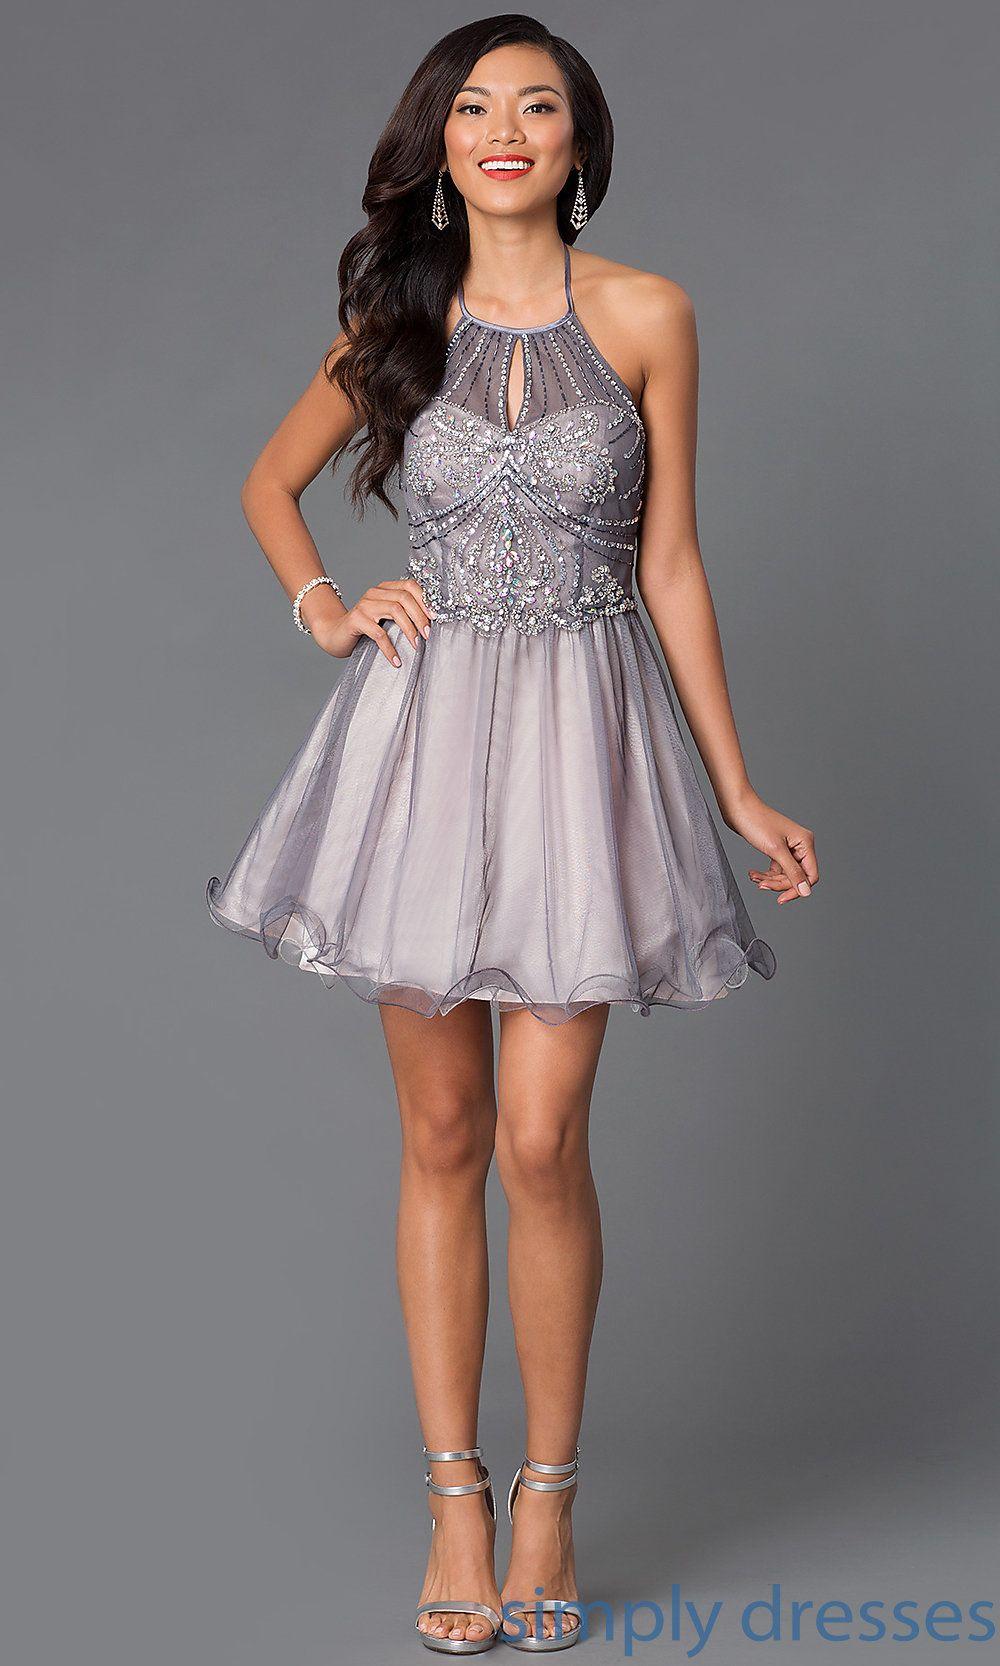 View dress detail mq dresses pinterest